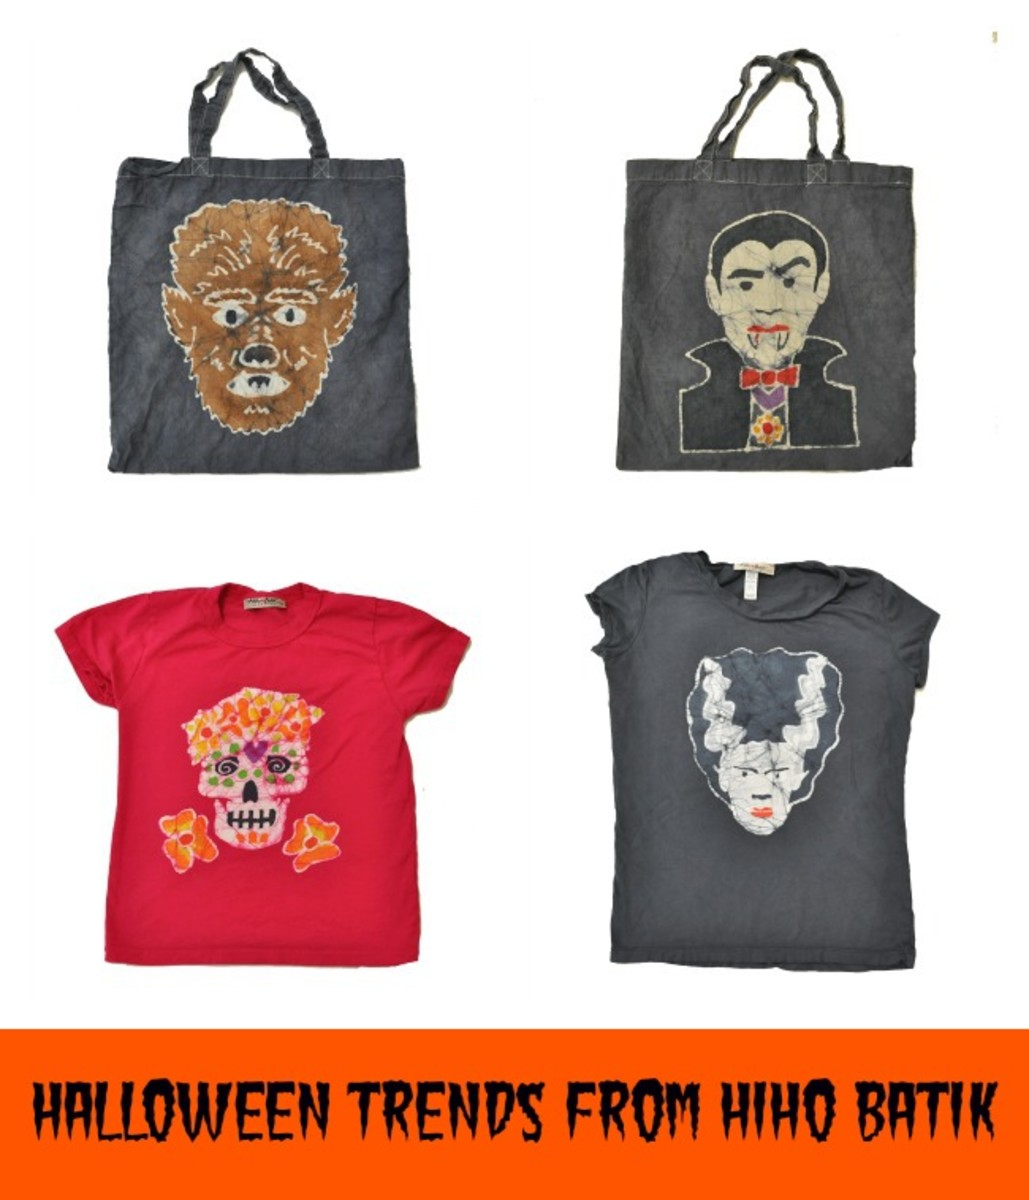 Halloween Fashions, Halloween Trends